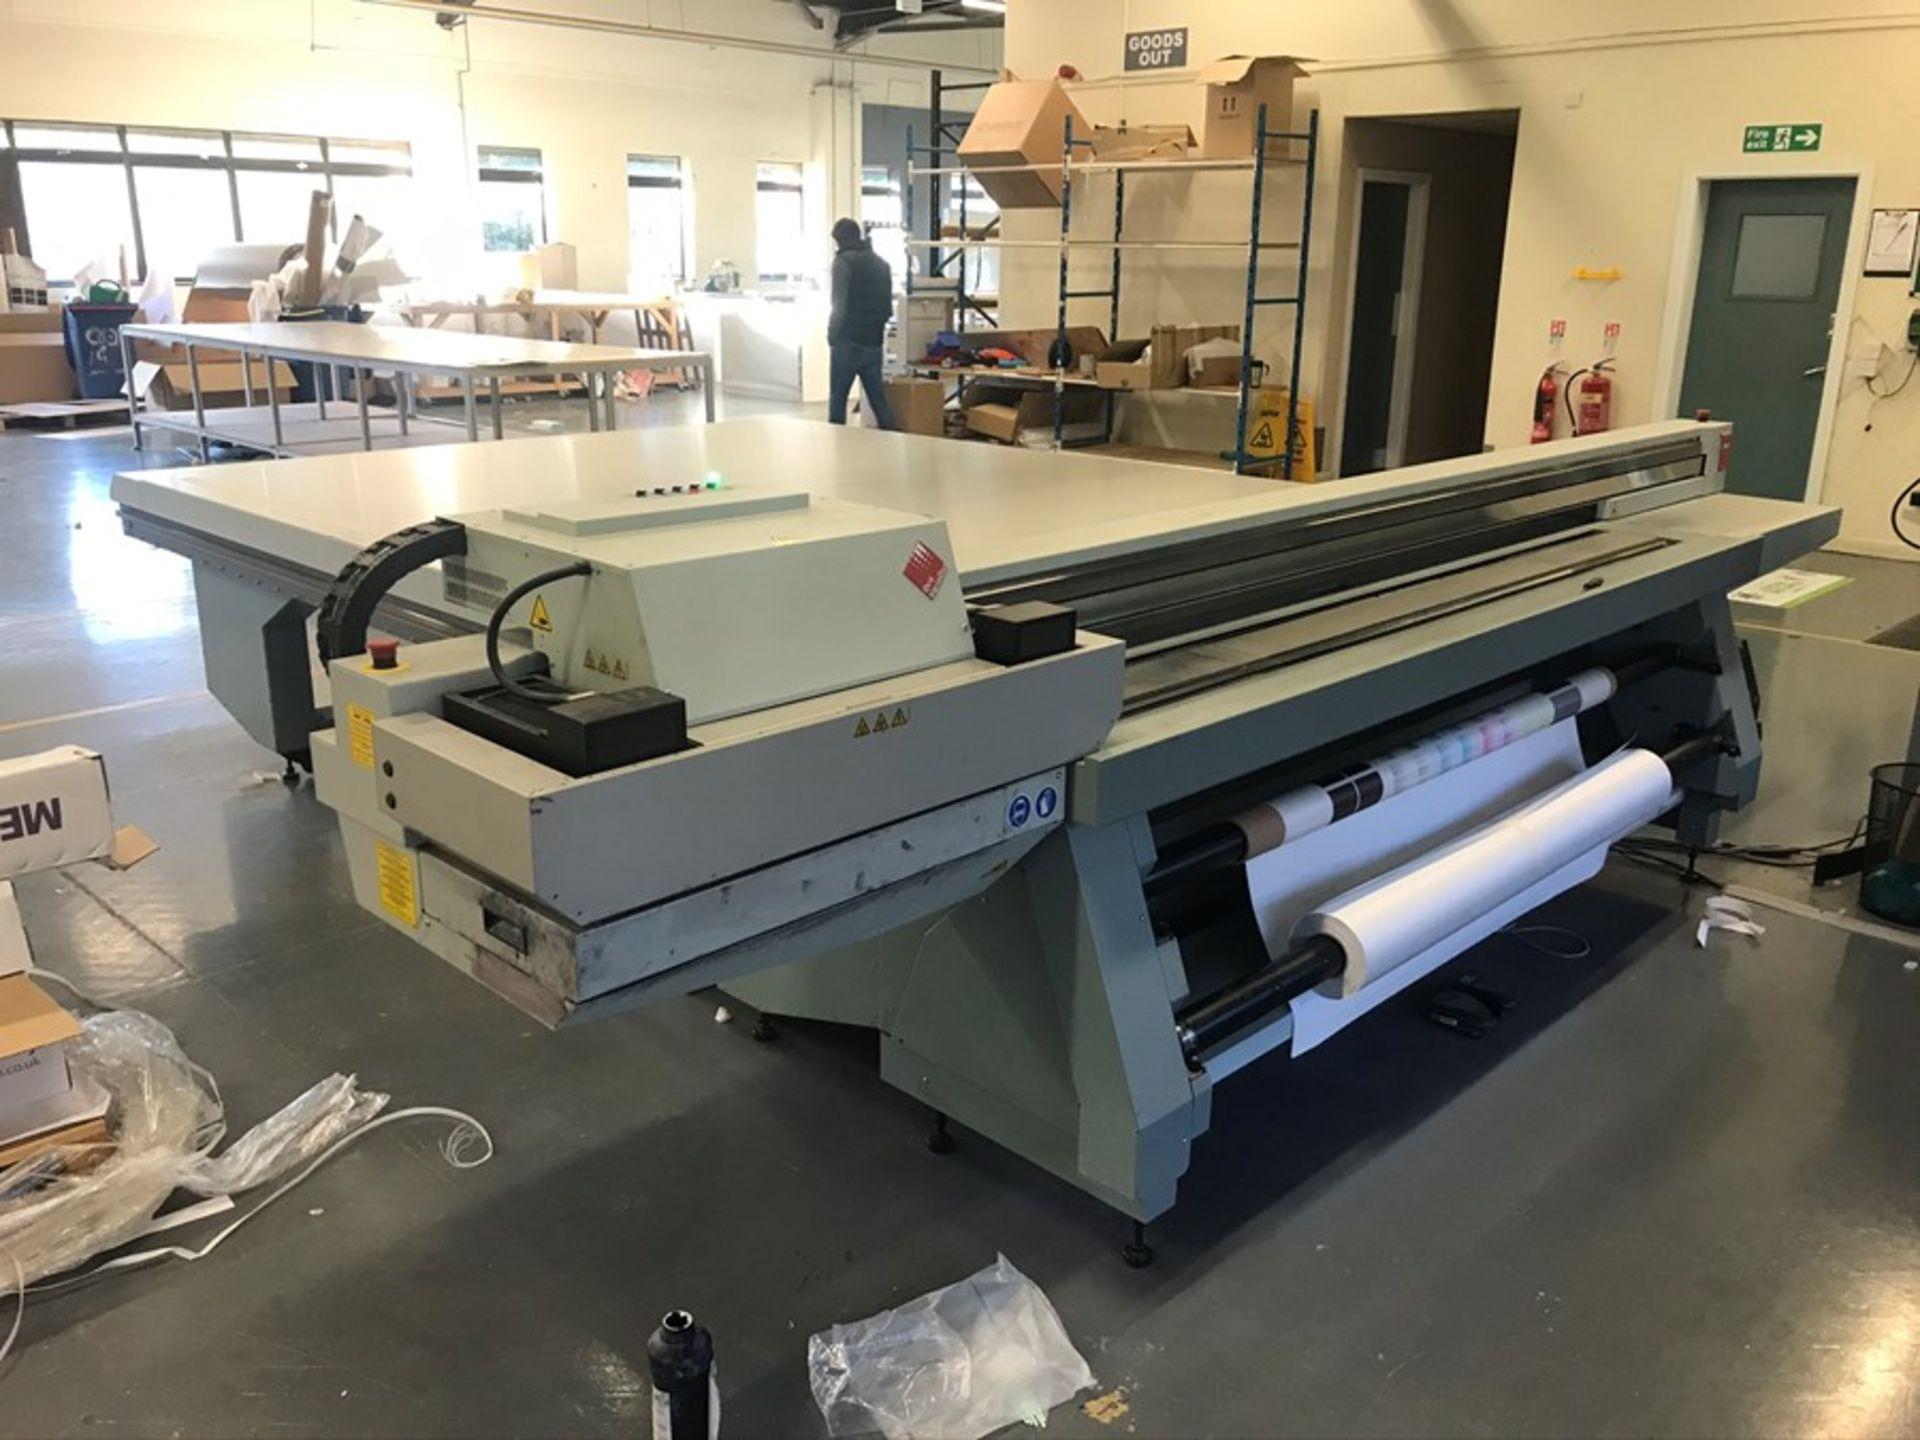 Oce Arizona 550XT + WIO UV flatbed printer (2013) - Image 2 of 22